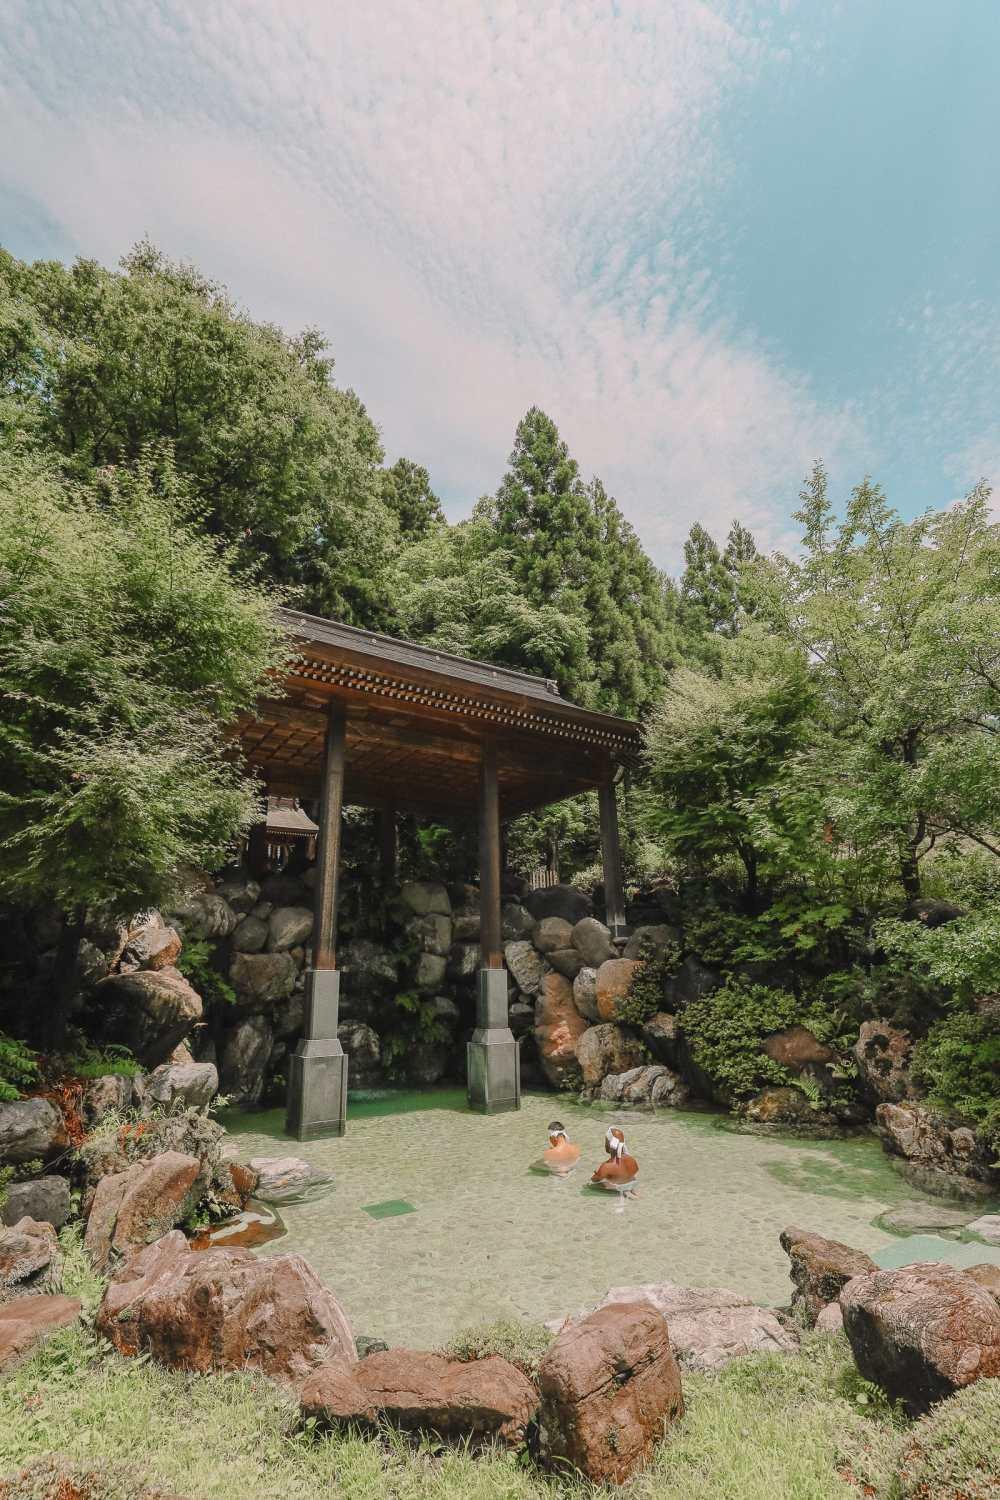 A Misogi Purification Ritual And Temples In Hakusan City - Japan (40)